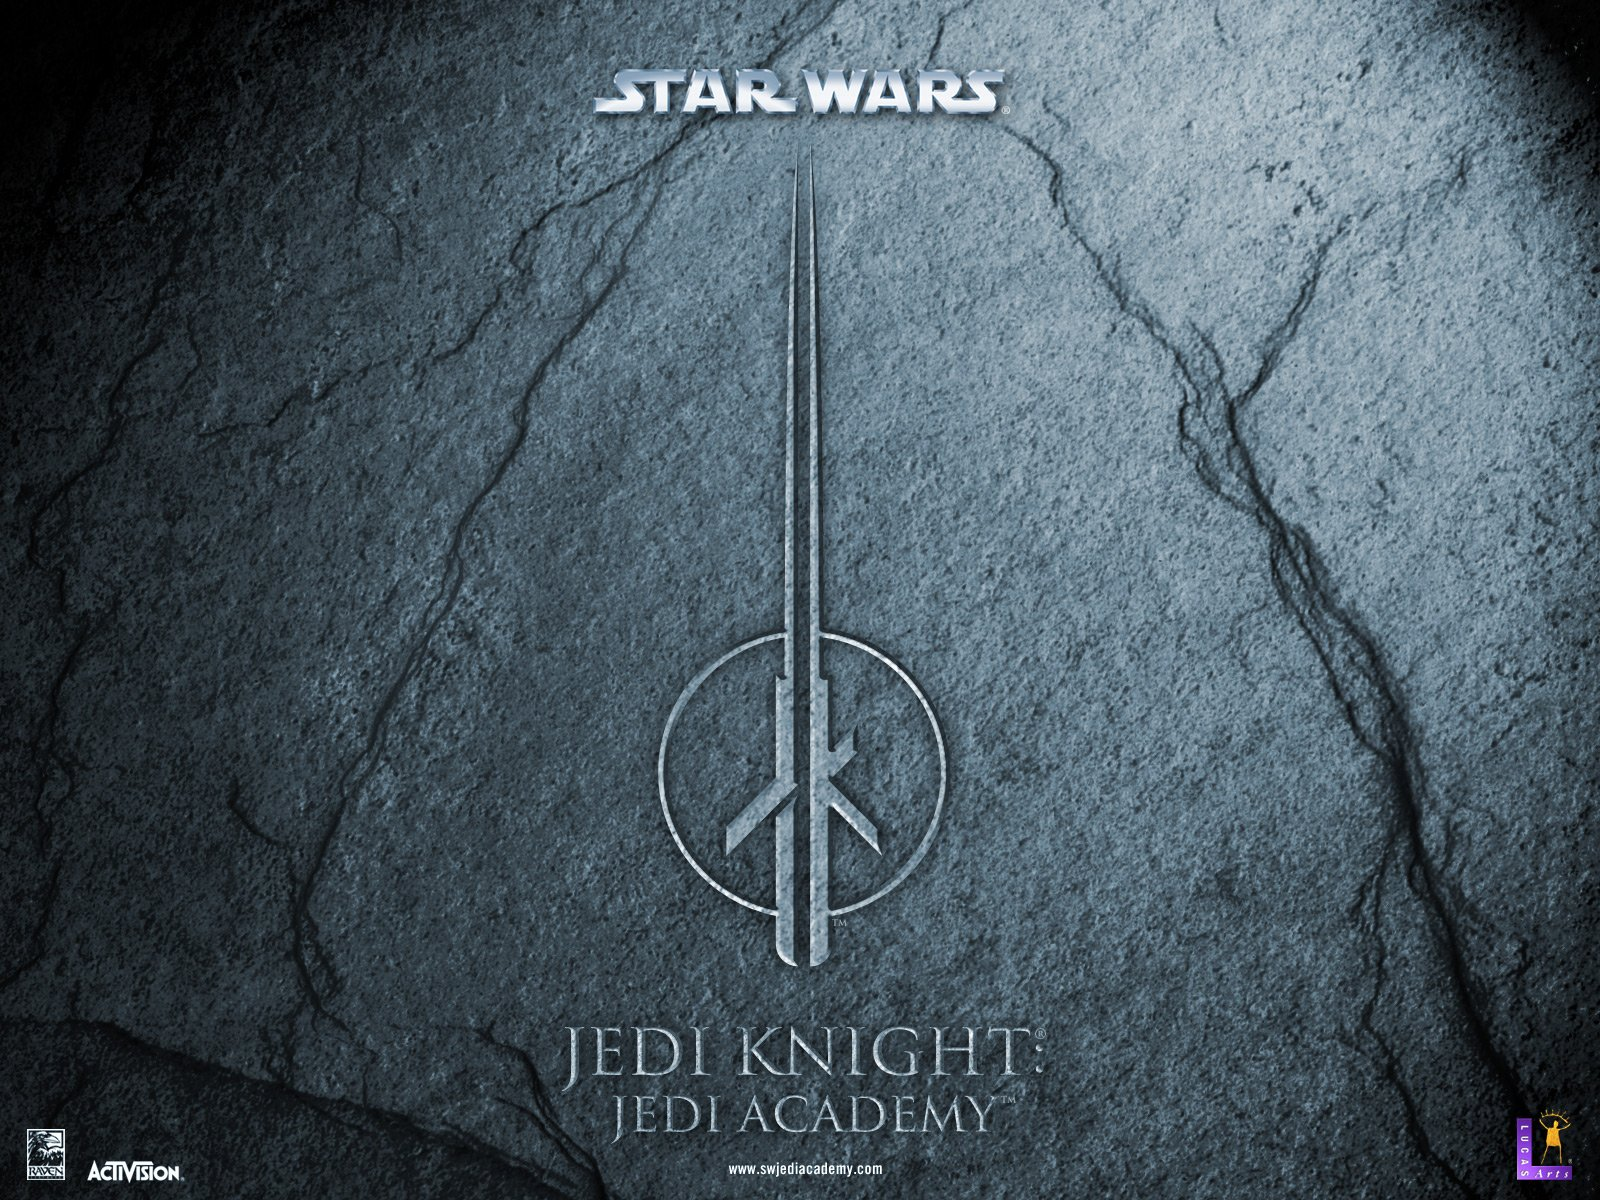 Мультиплеер Star Wars Jedi Knight: Jedi Academy - день 1. - Изображение 1